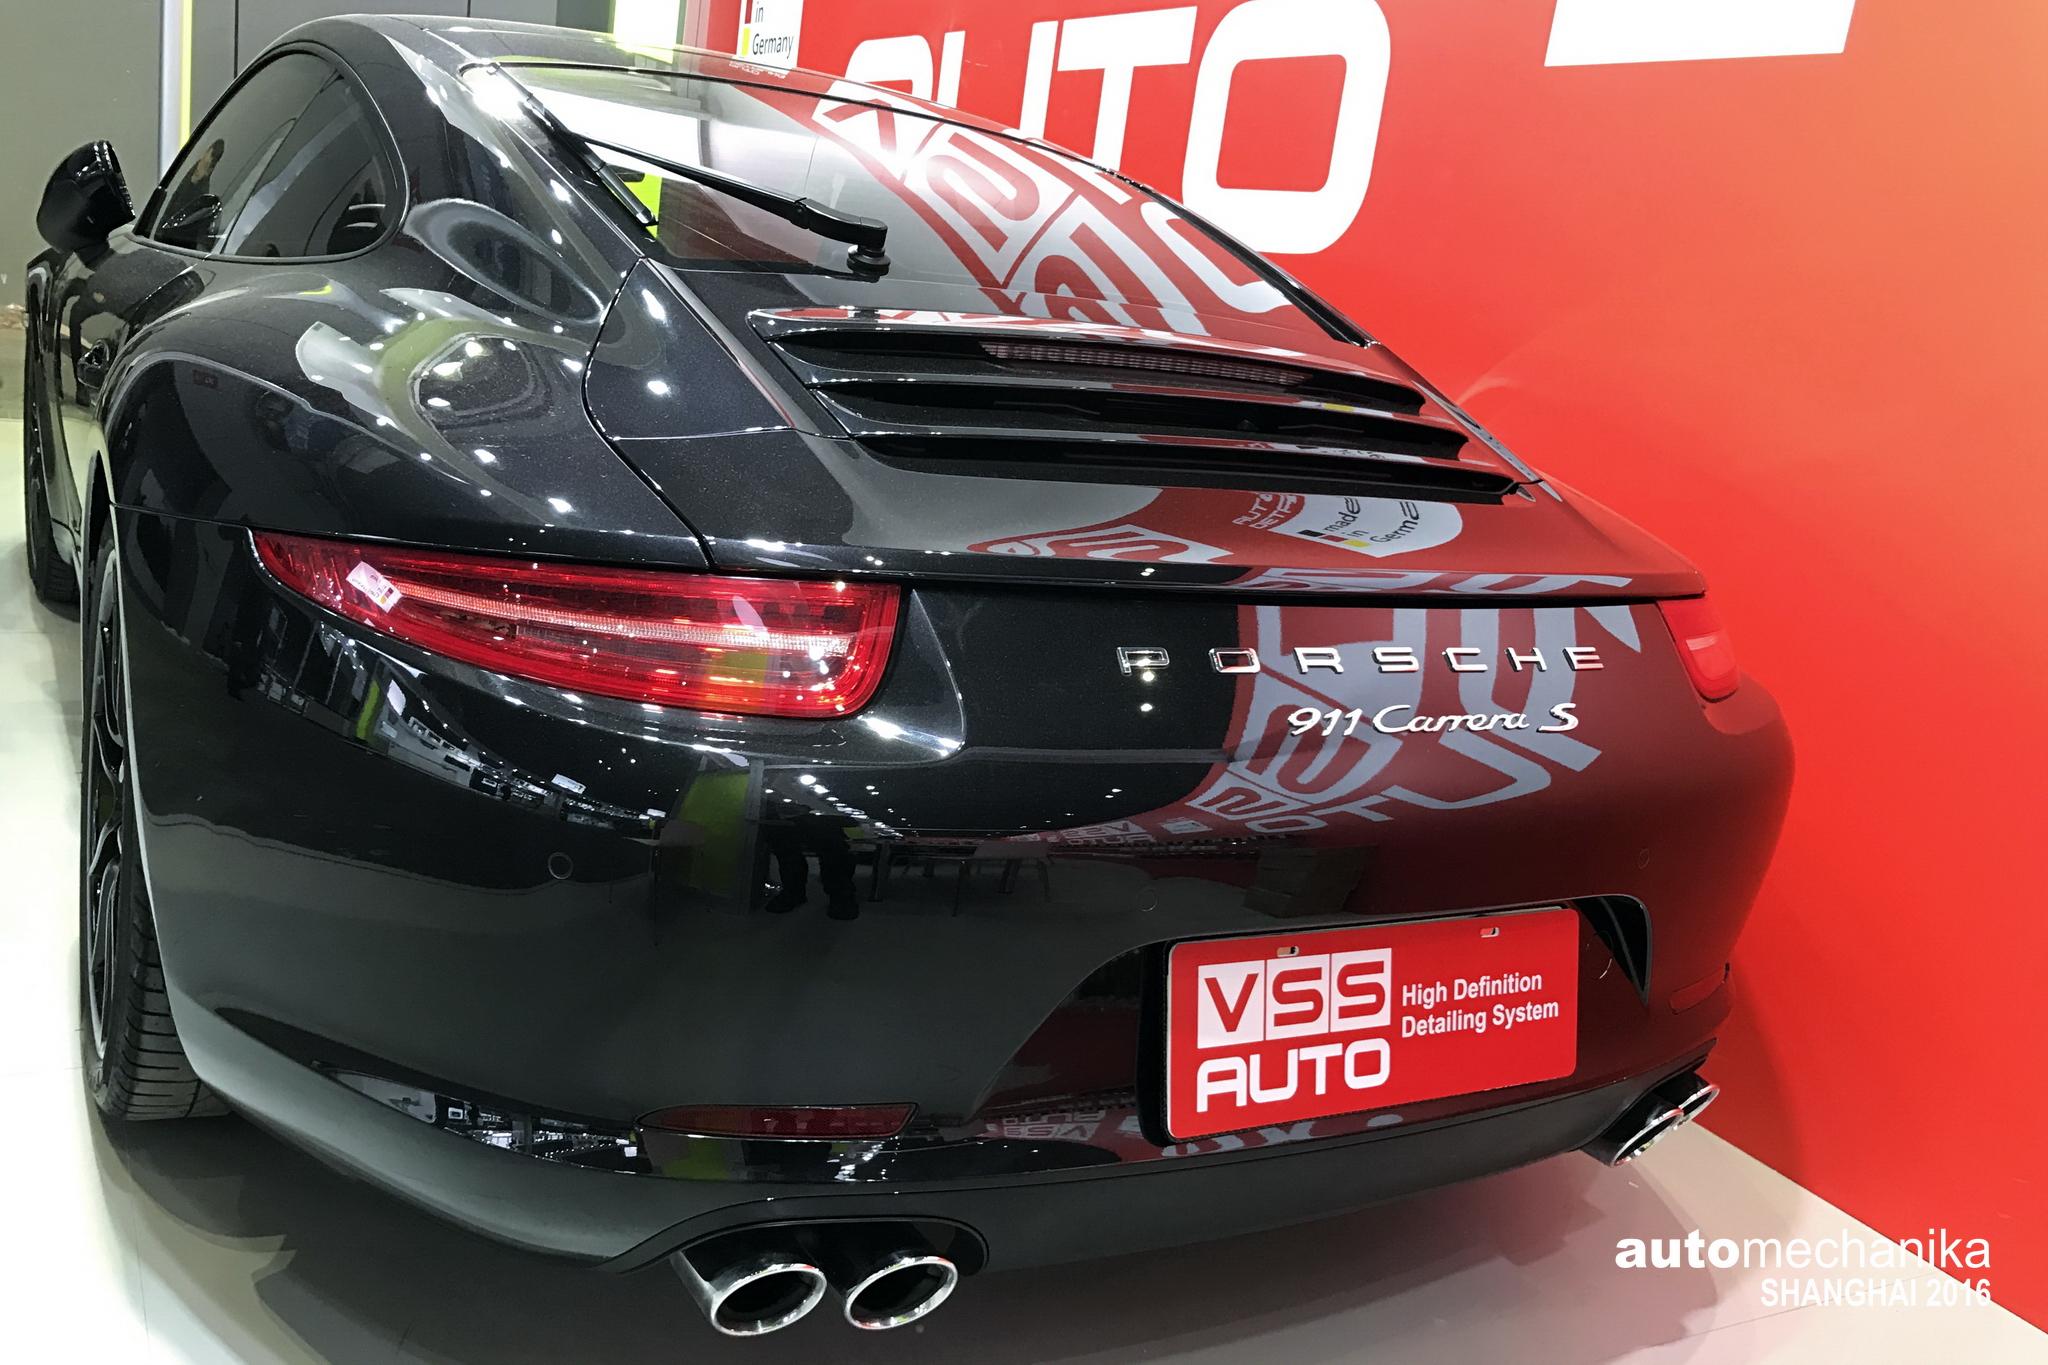 vss-auto-automechanika-shanghai-9